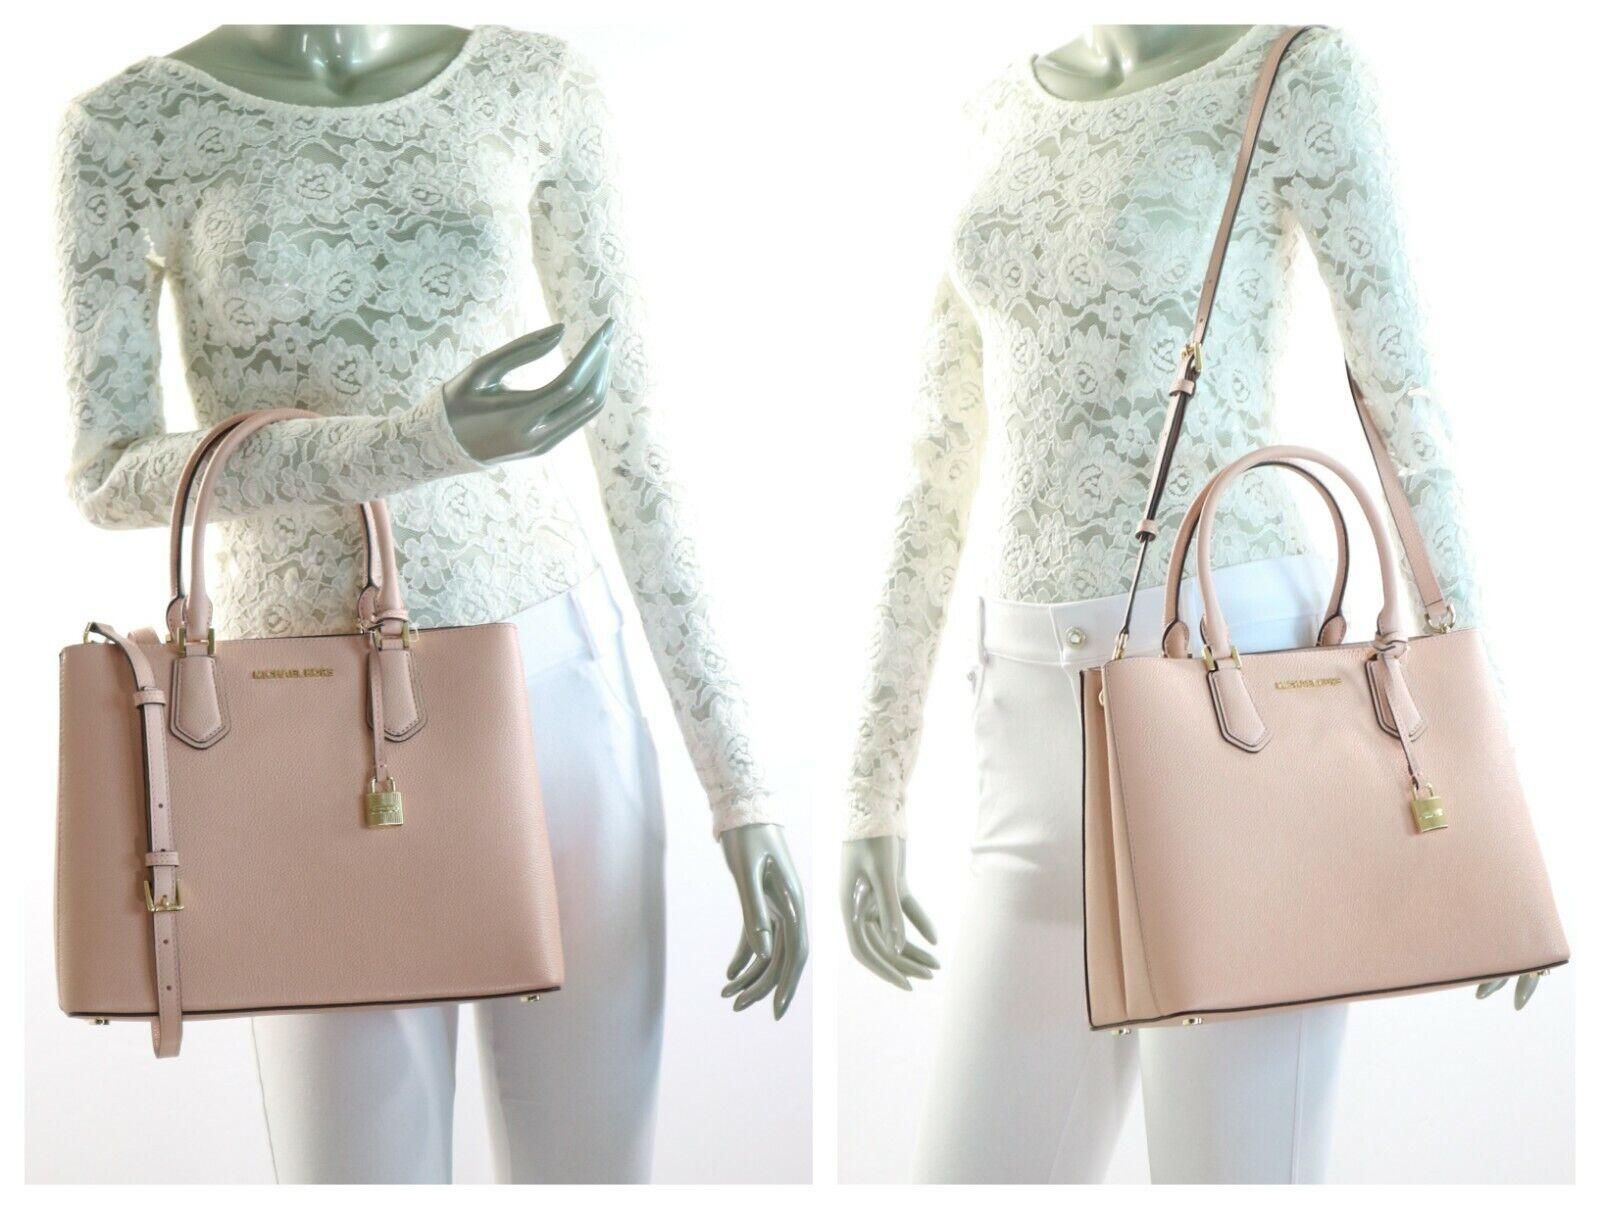 78ac52db08db Michael Kors Adele Mercer Large Satchel Pastel Pink Ballet Leather  Crossbody Bag